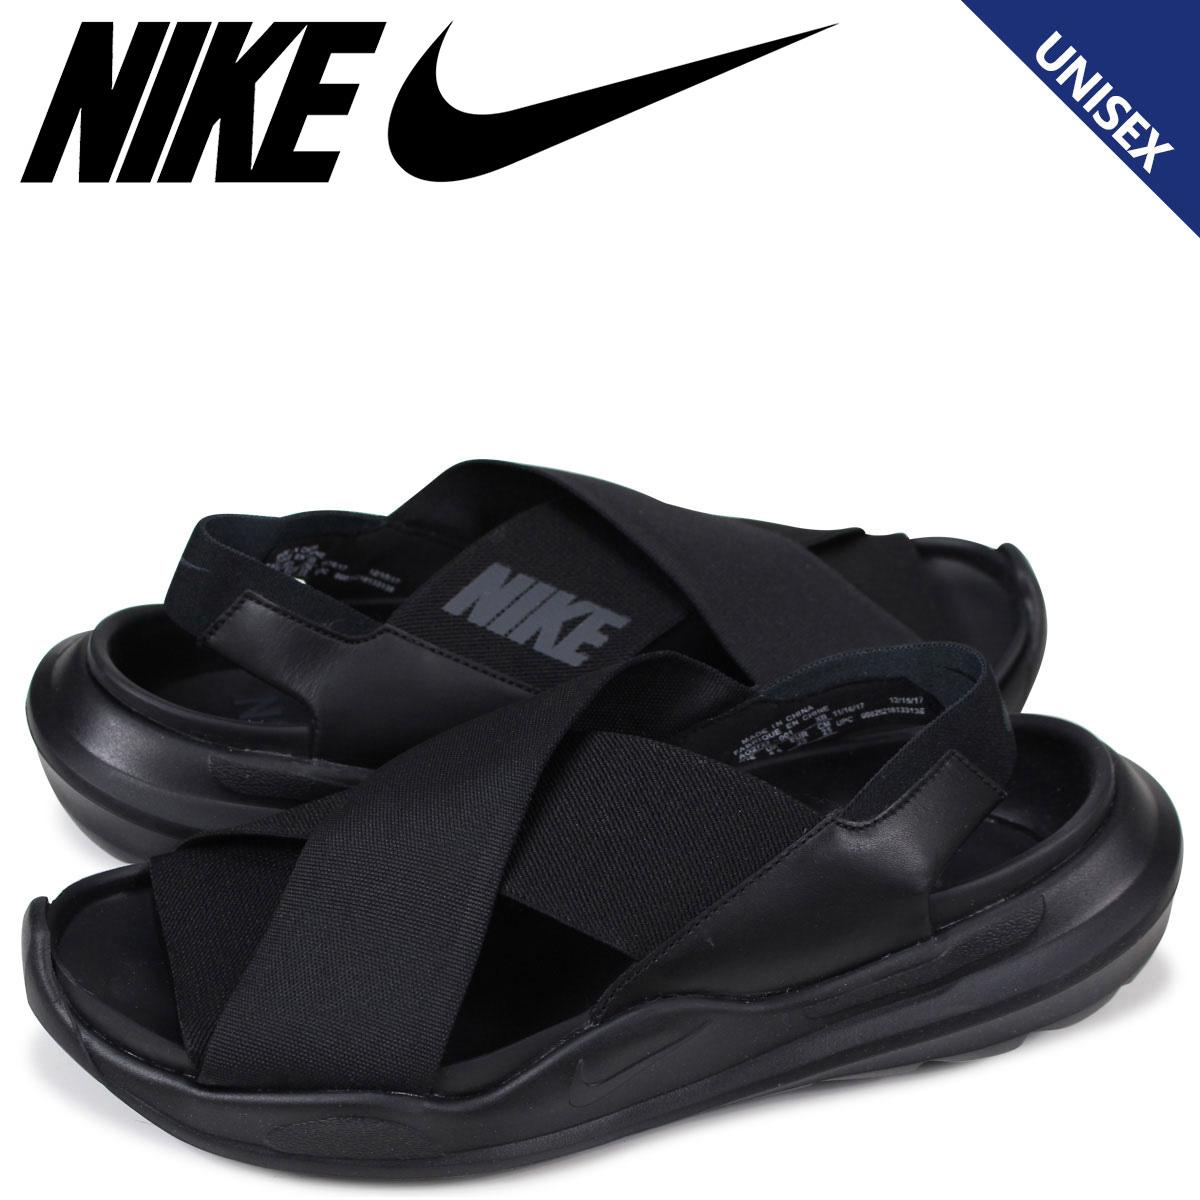 0421df4b3 SneaK Online Shop  Nike NIKE Lady s men sandals WMNS PRAKTISK AO2722 ...